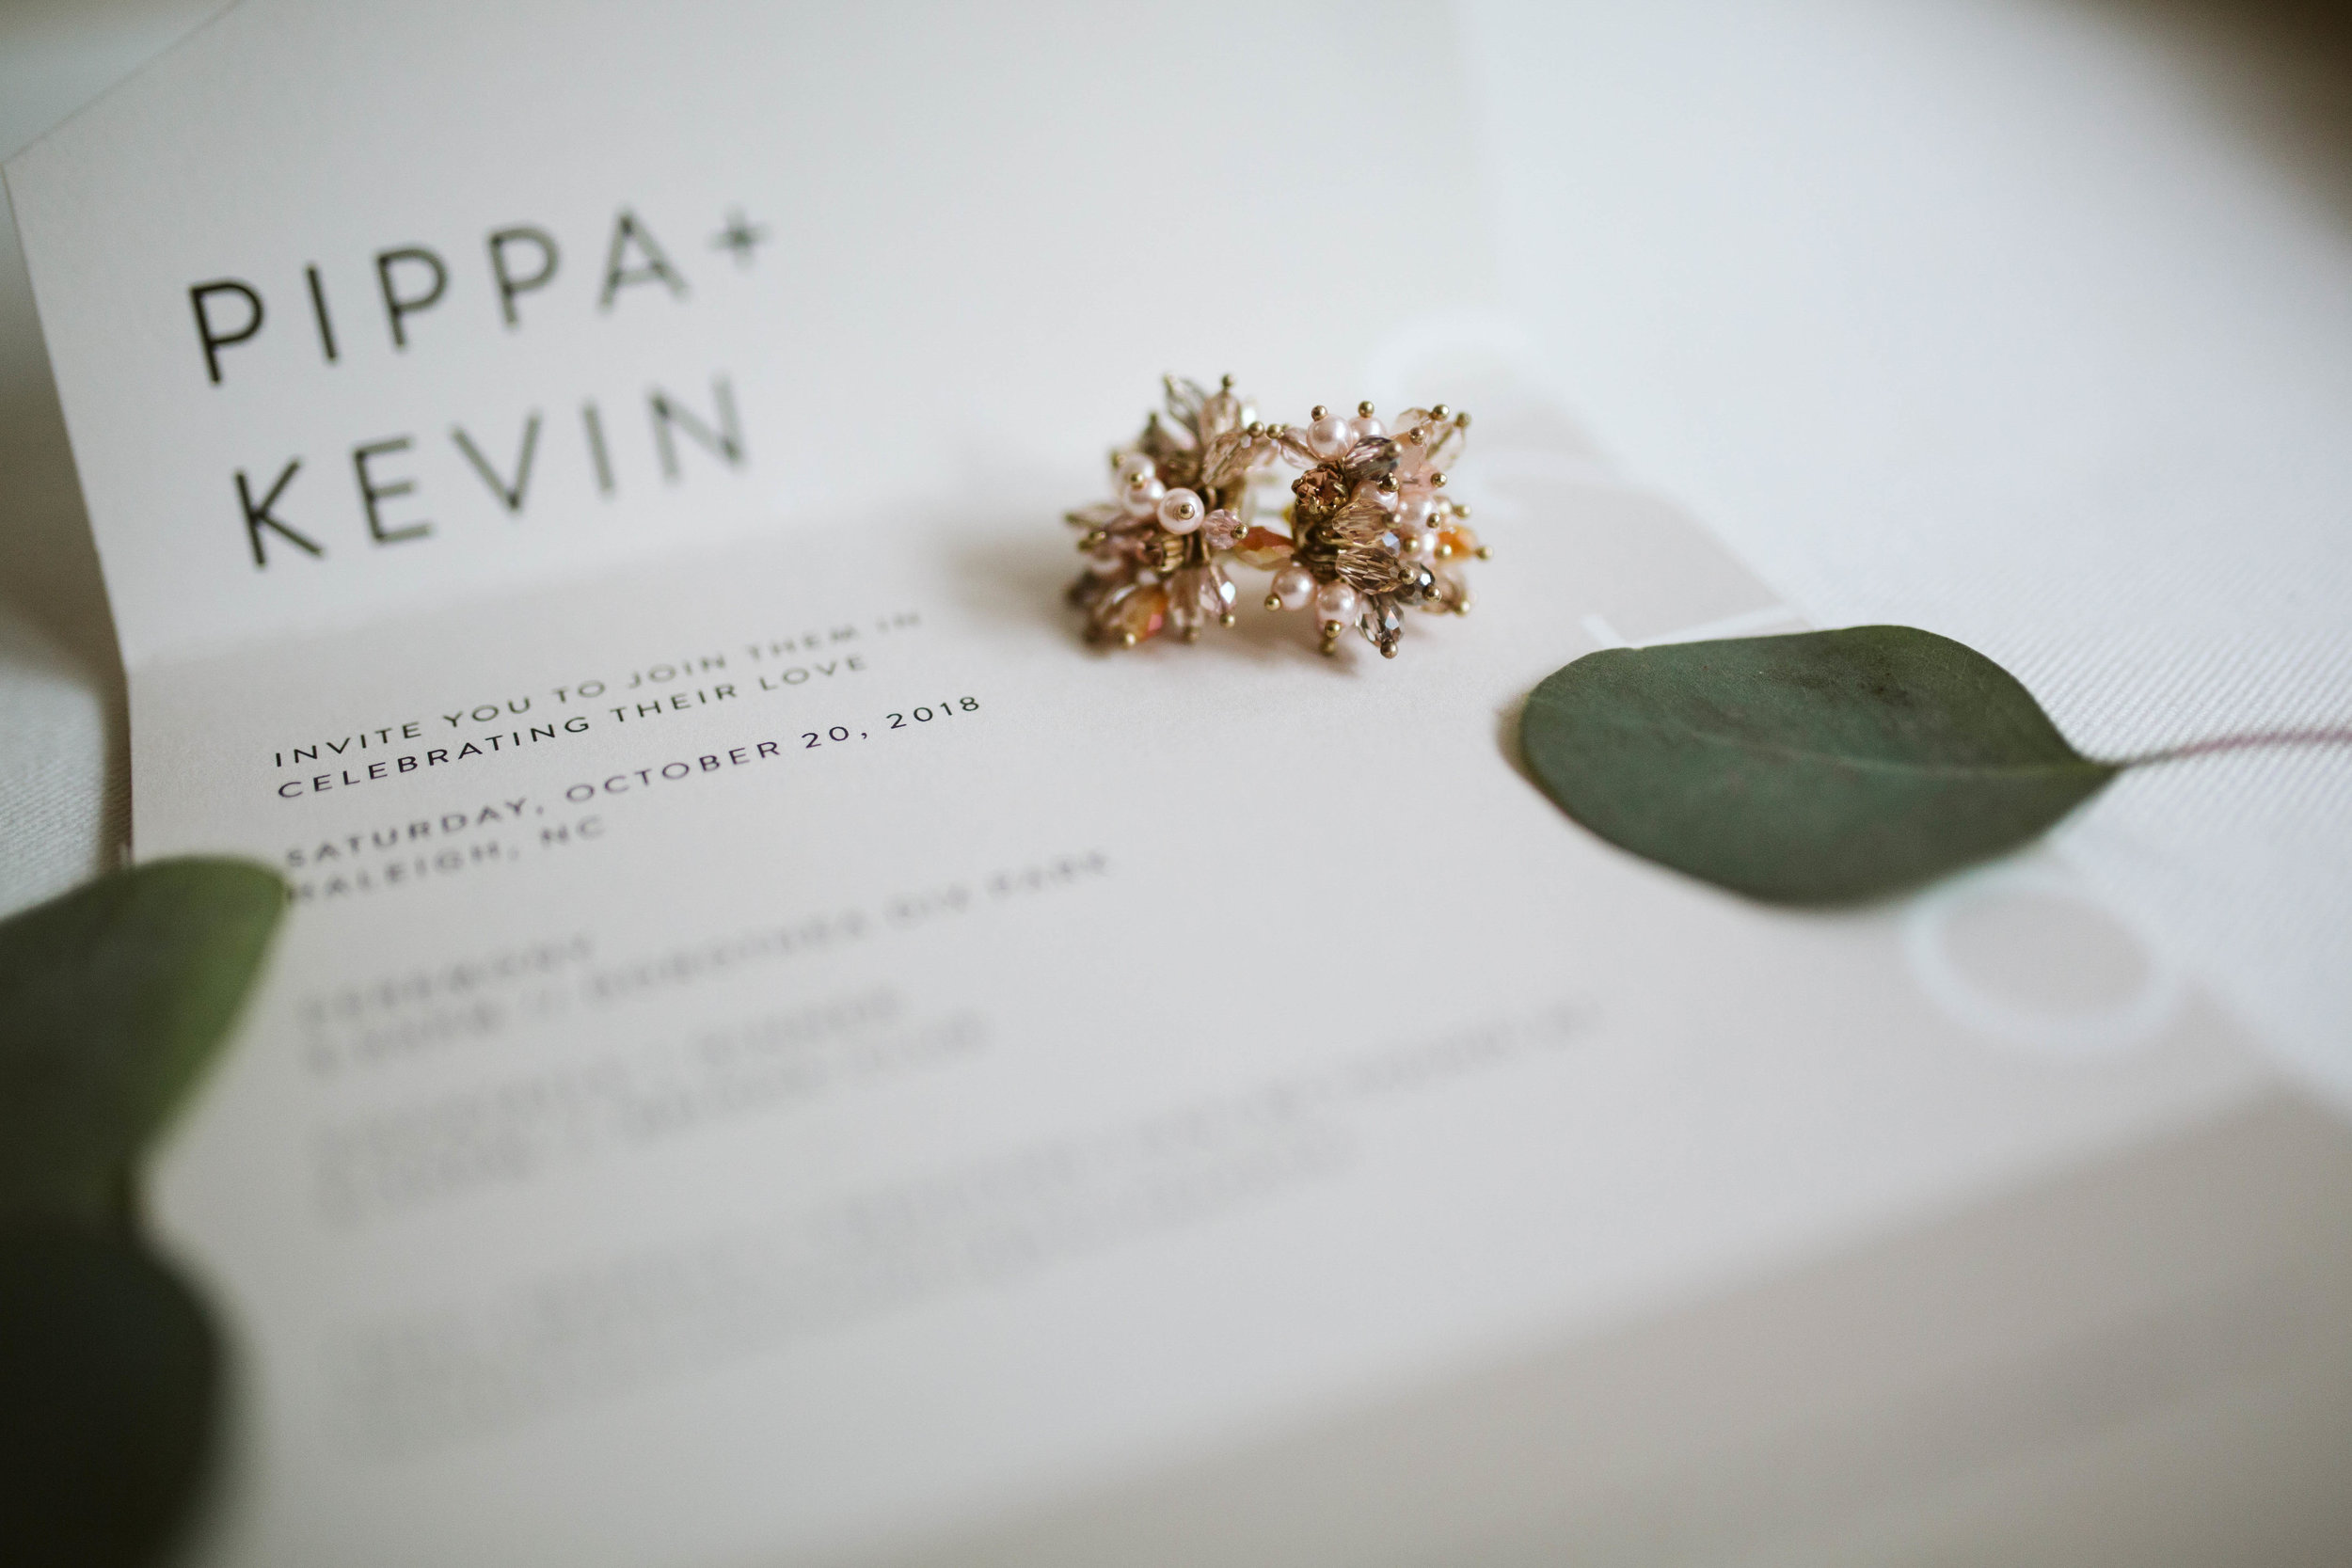 PippaKevin13-2.jpg